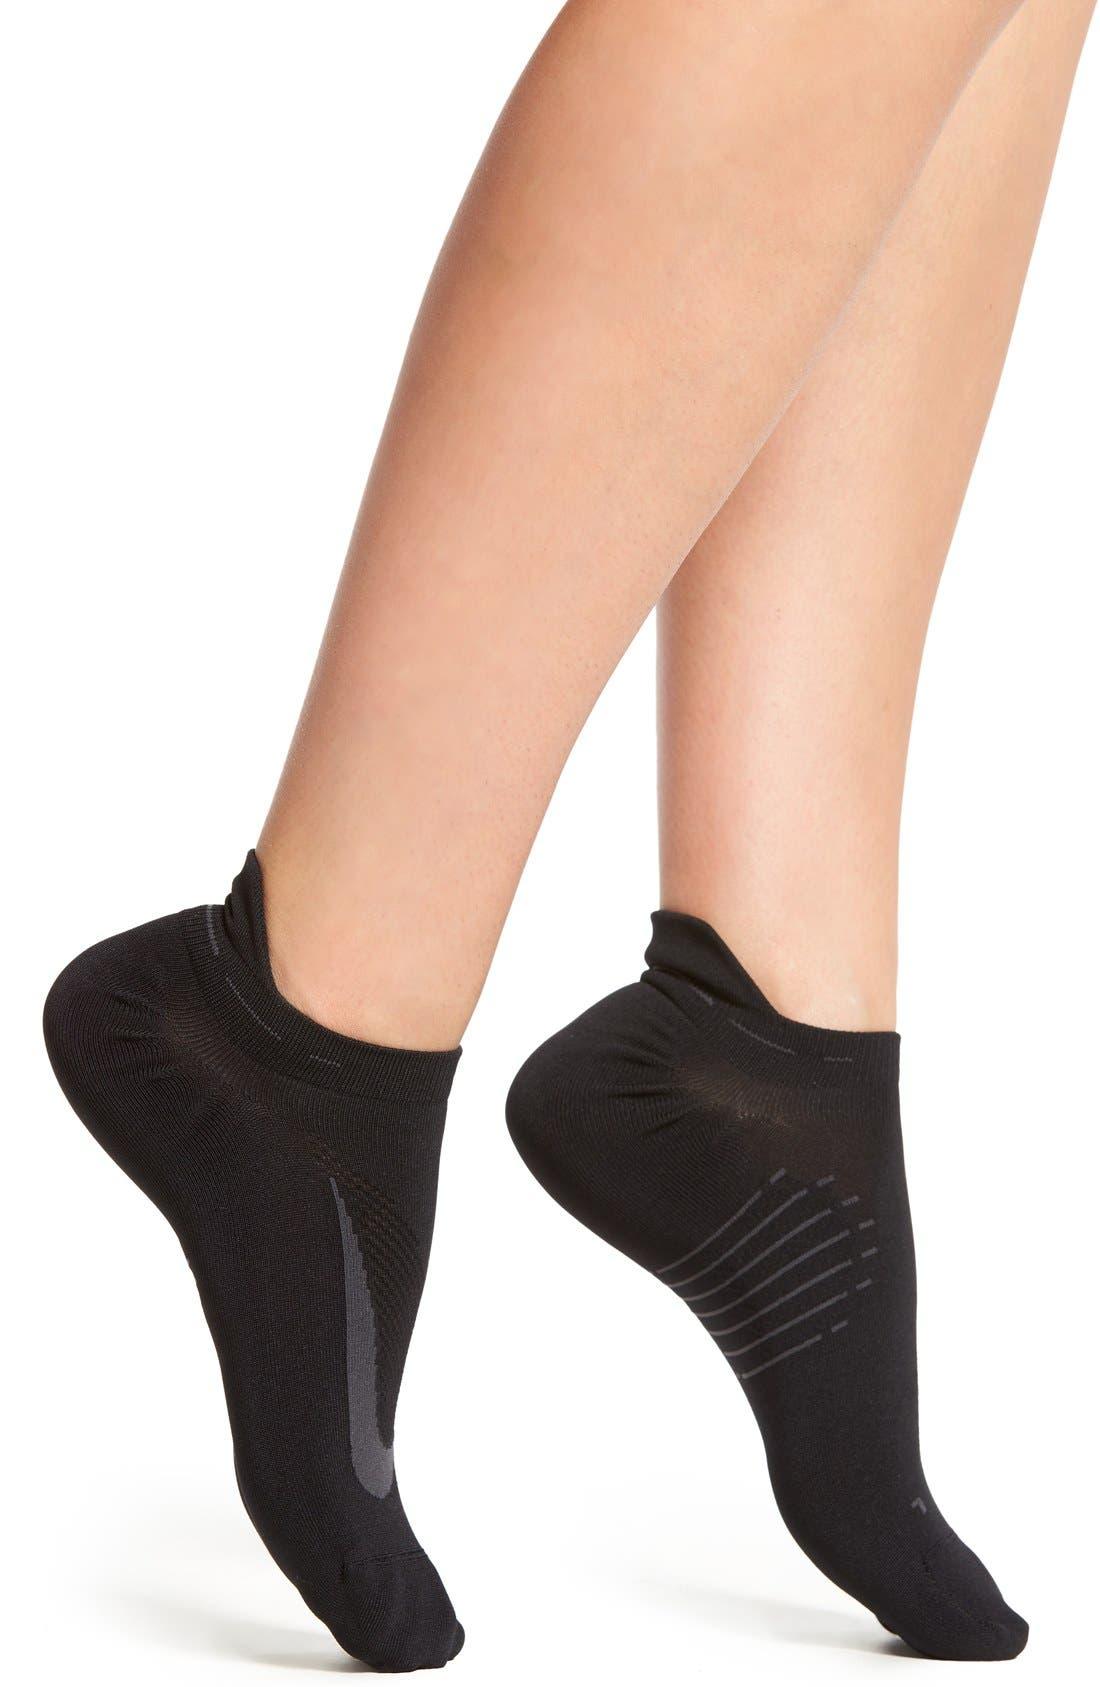 'Elite' No-Show Running Socks,                         Main,                         color, 001